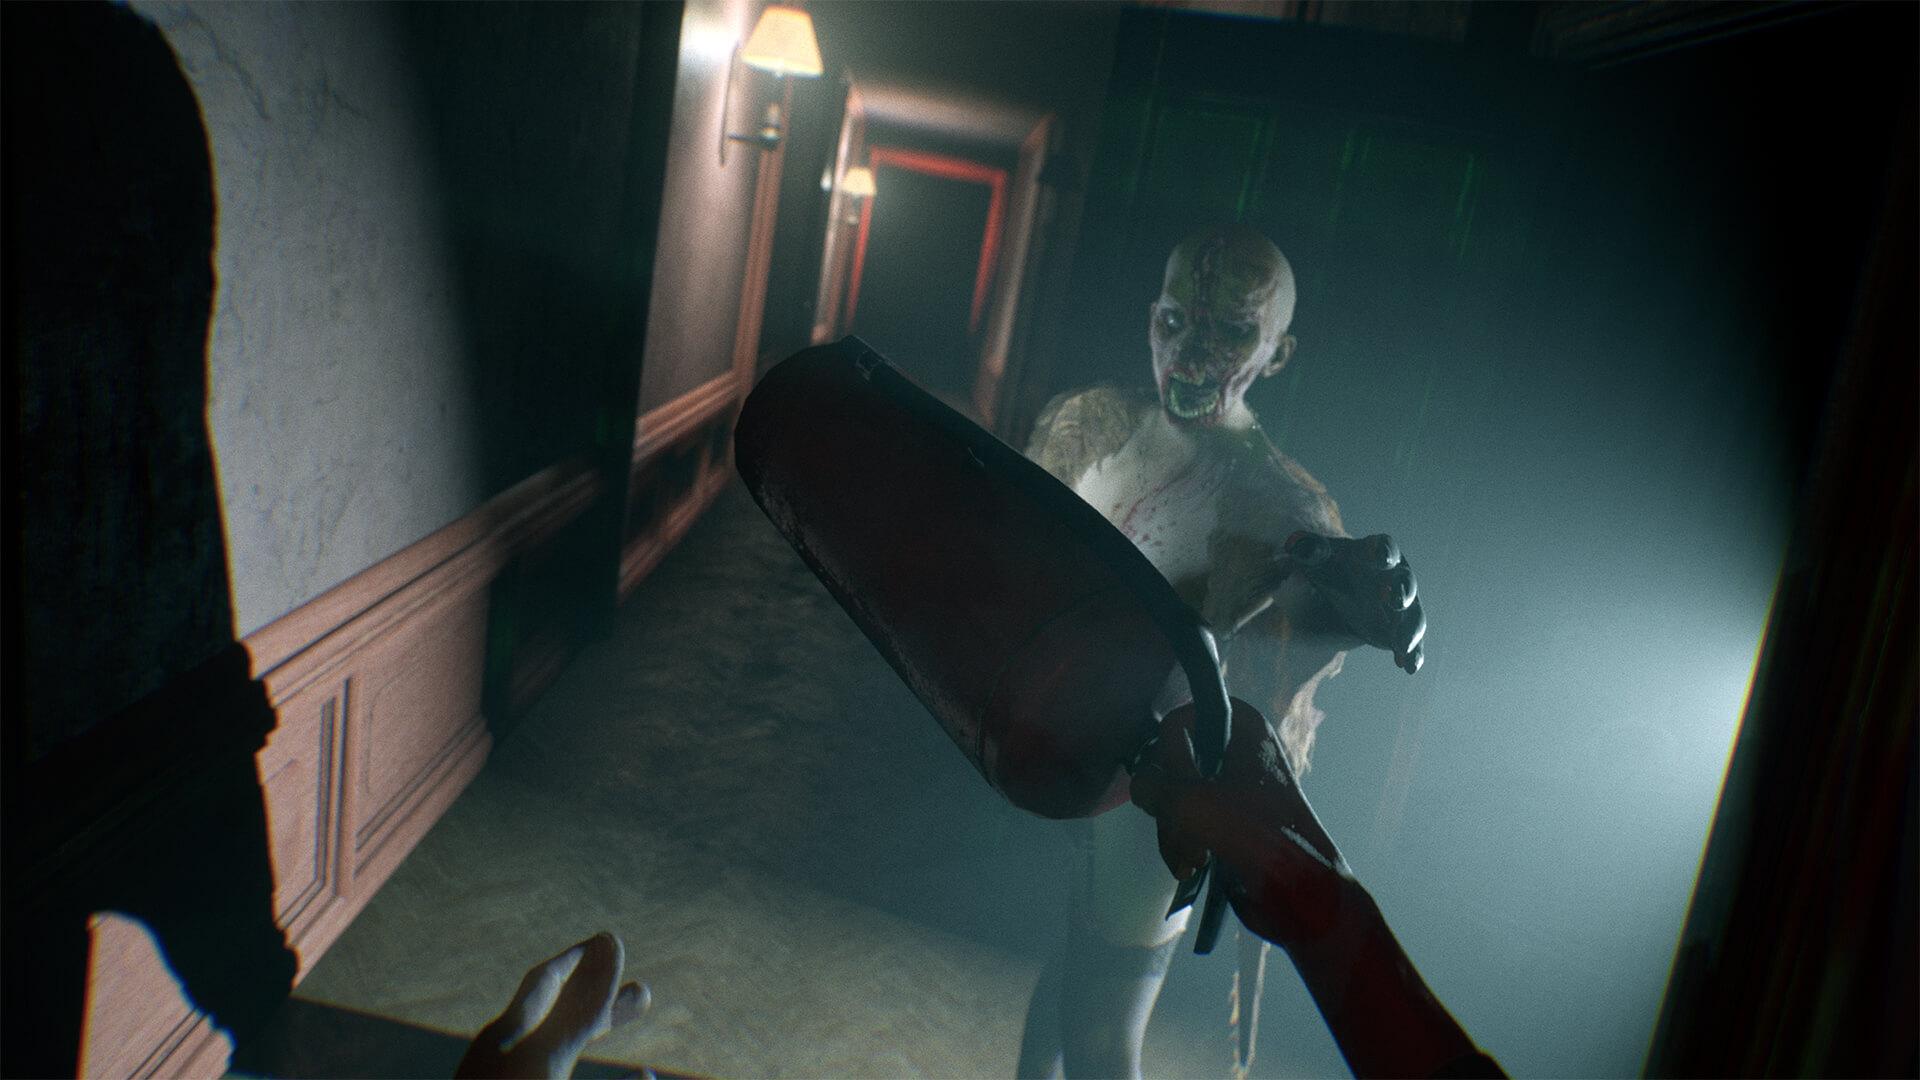 Paranoid، عنوان جدید وحشت و بقا که توسط تیم توسعه عنوان Agony ساخته میشود